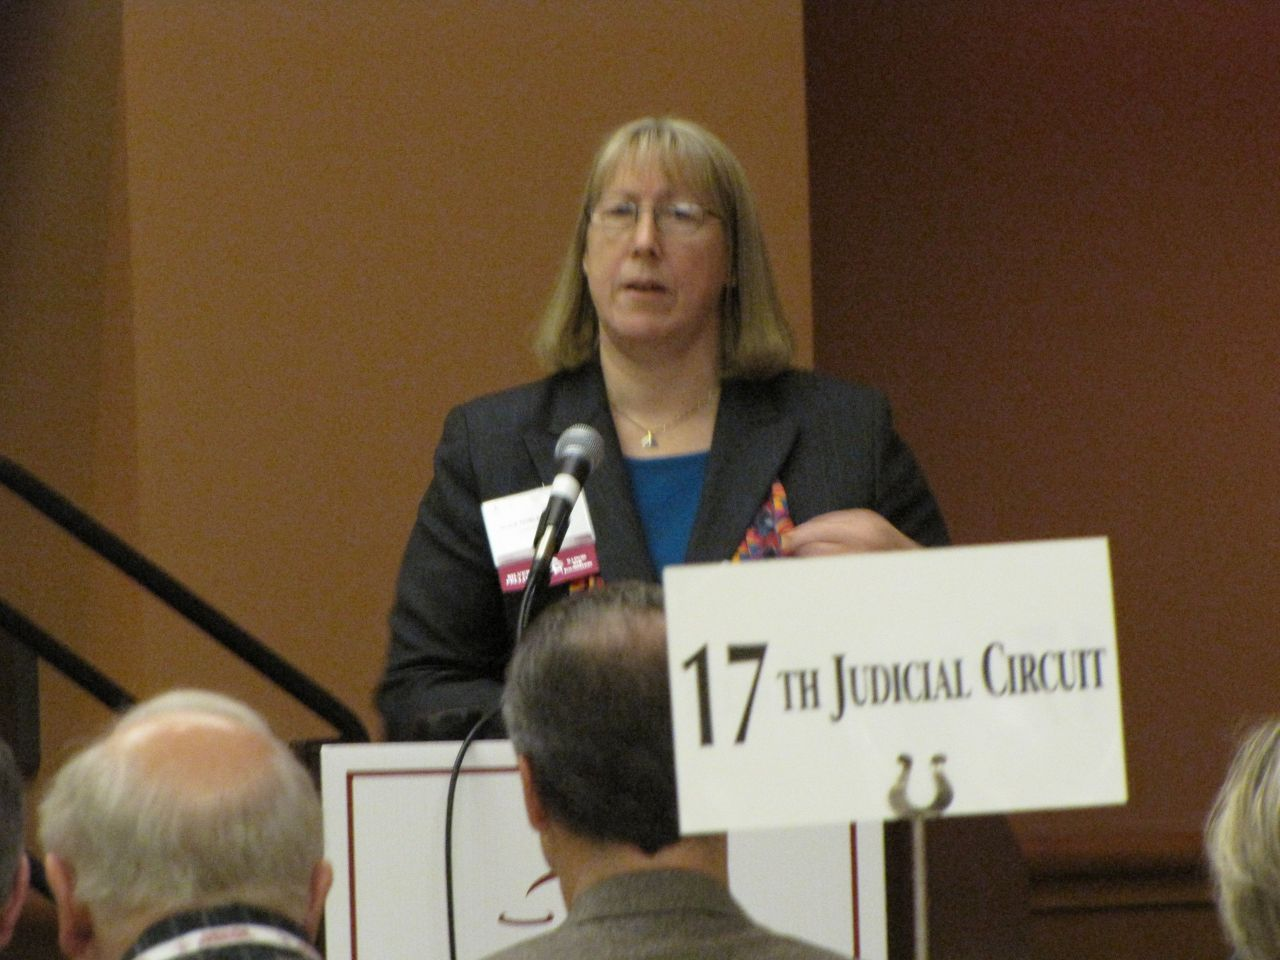 SIU Professor Alice Noble-Allgire speaks about diversity initiatives.